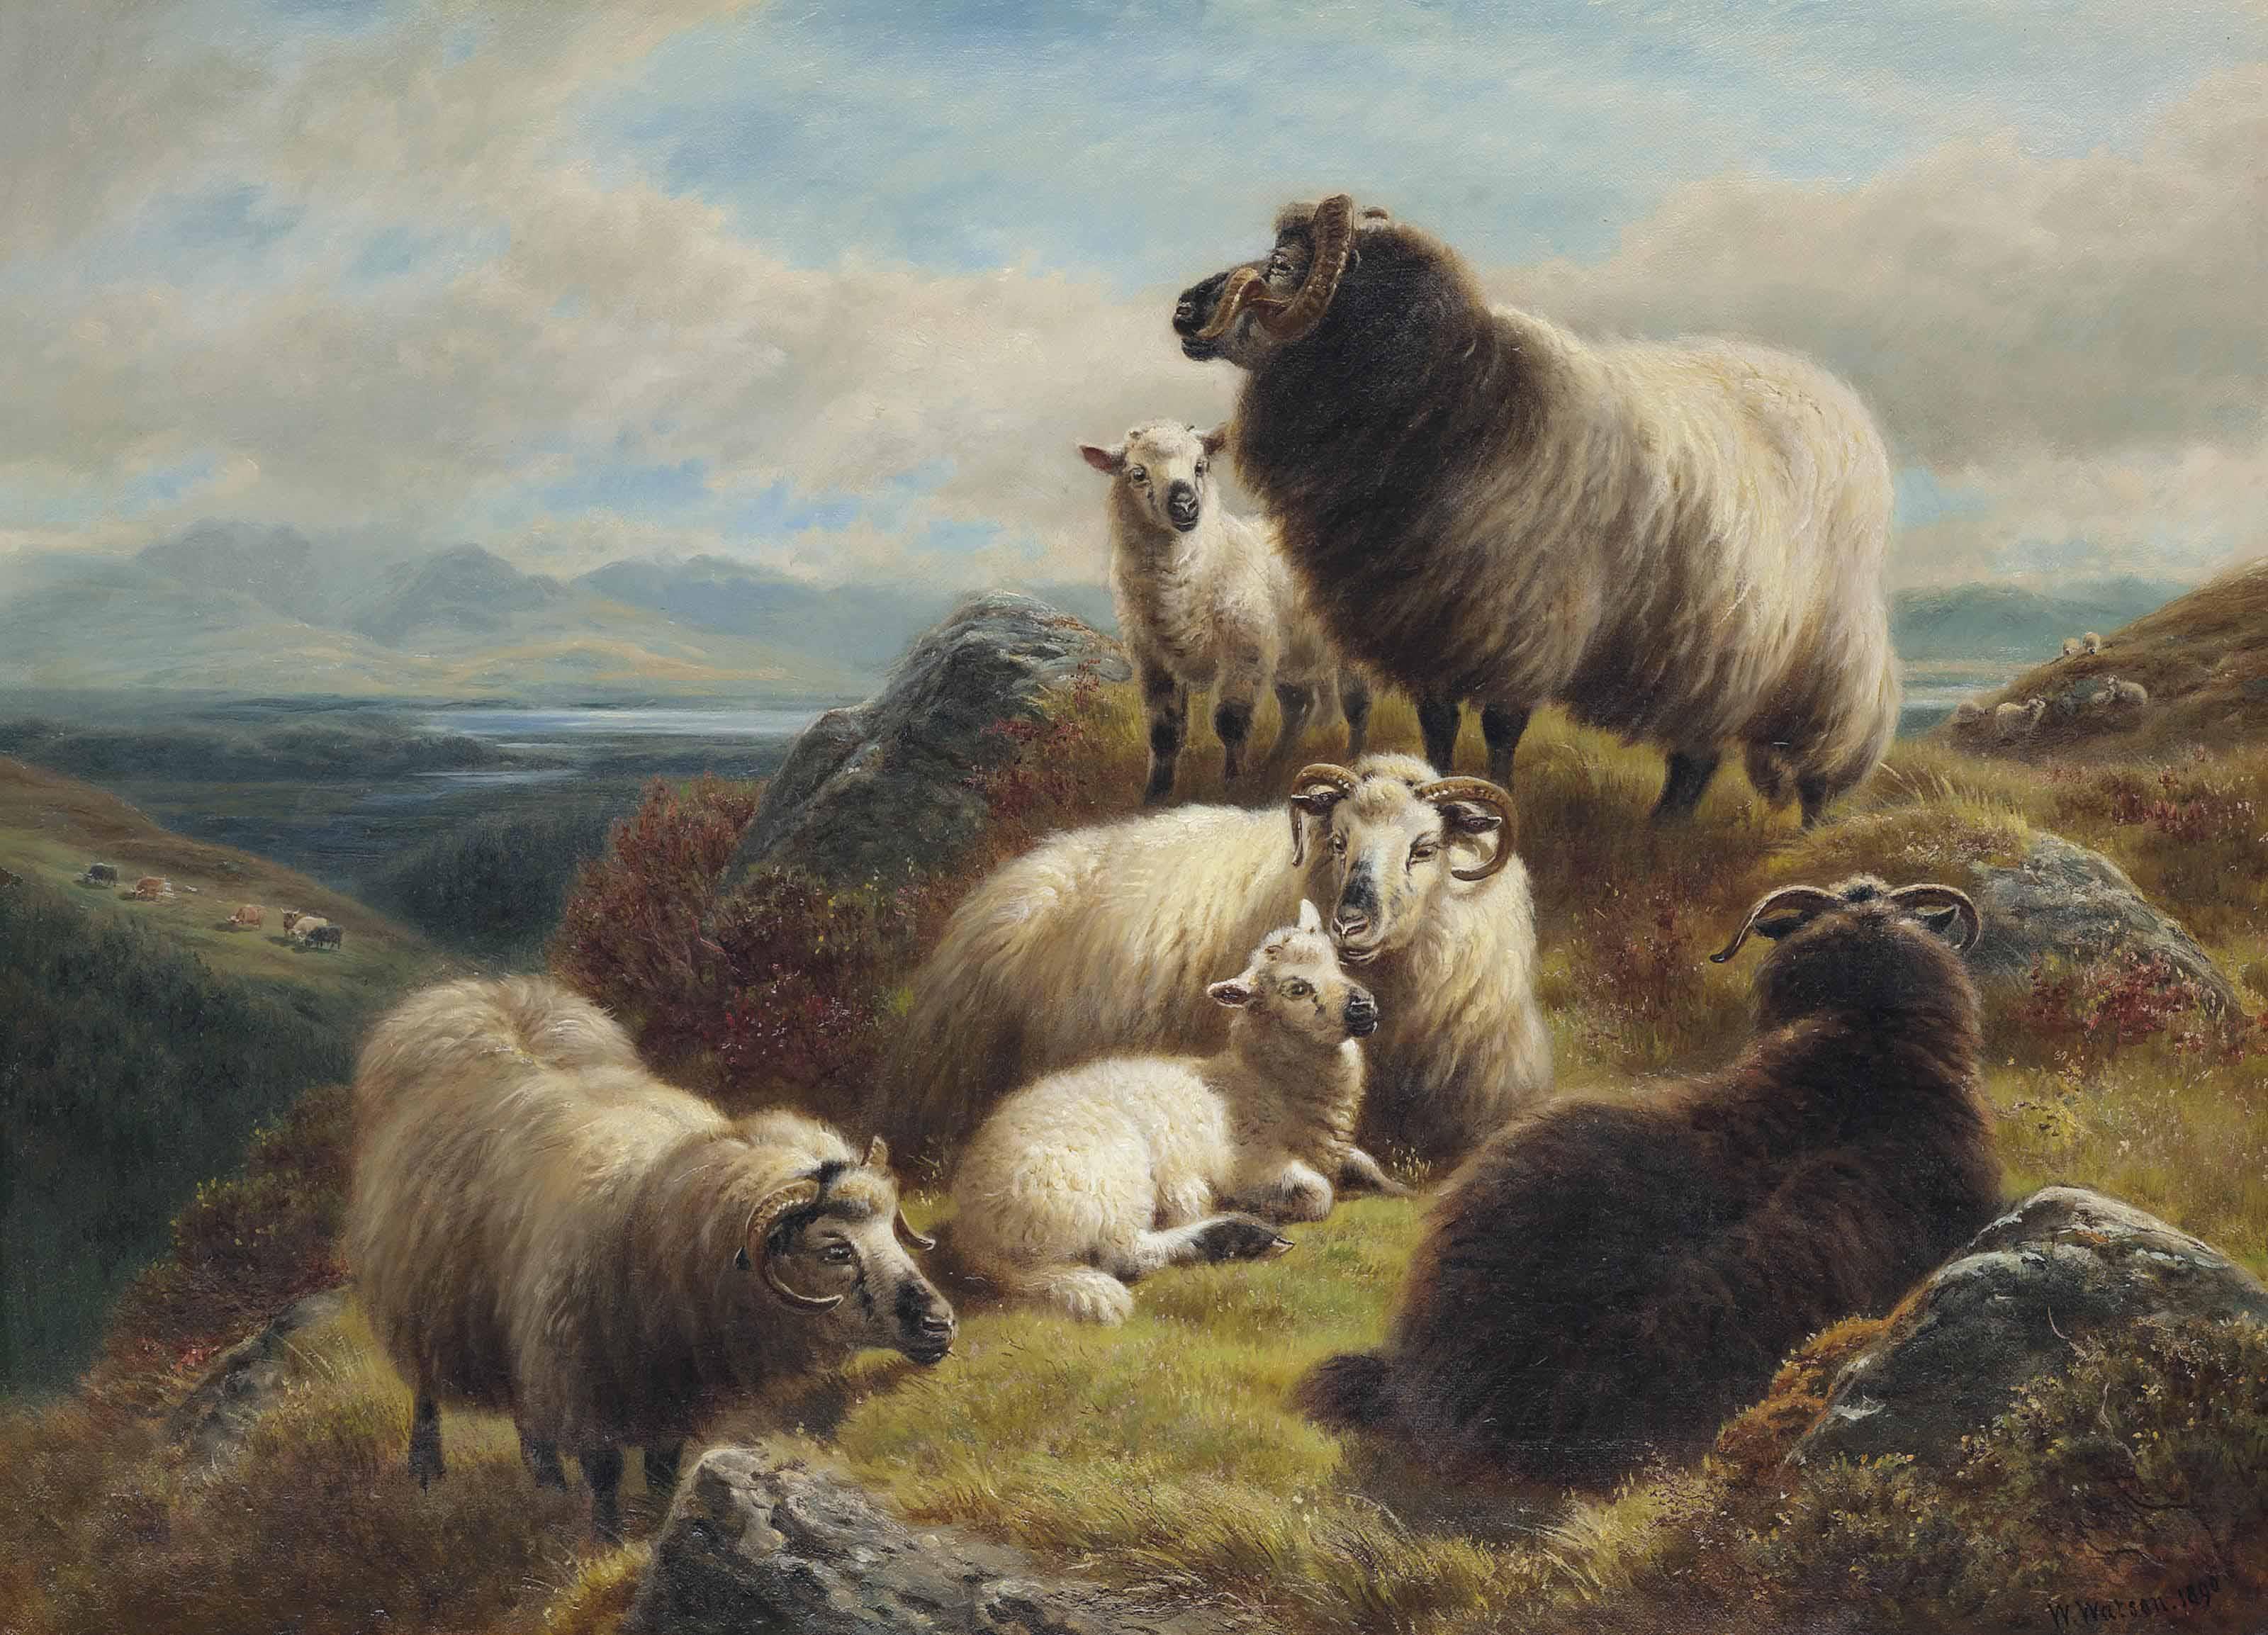 Sheep in a highland landscape